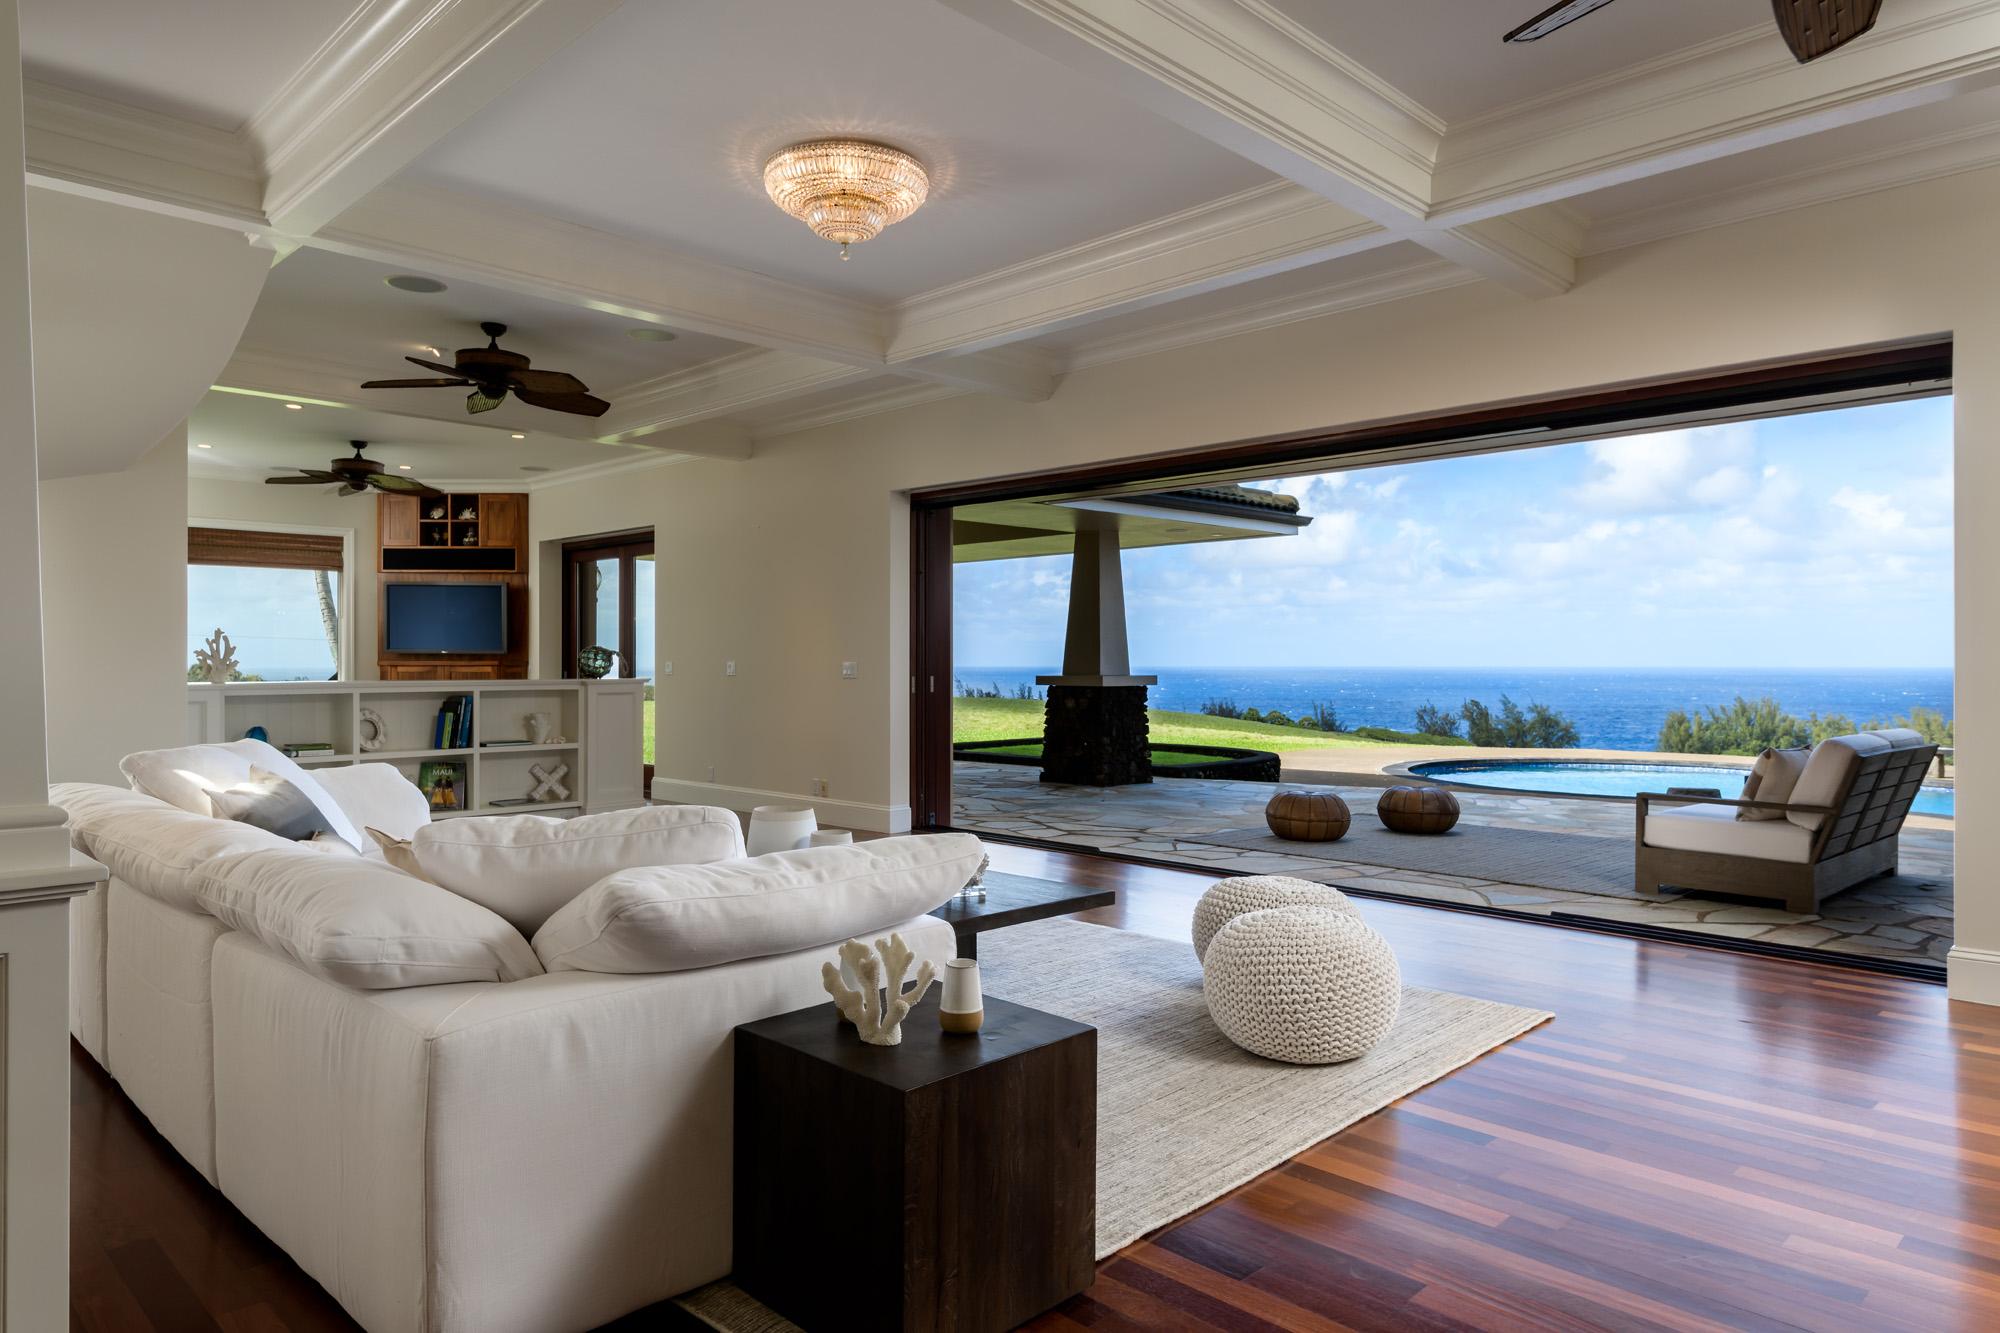 luxury blufftop compound in maui hawaii 600 haumana